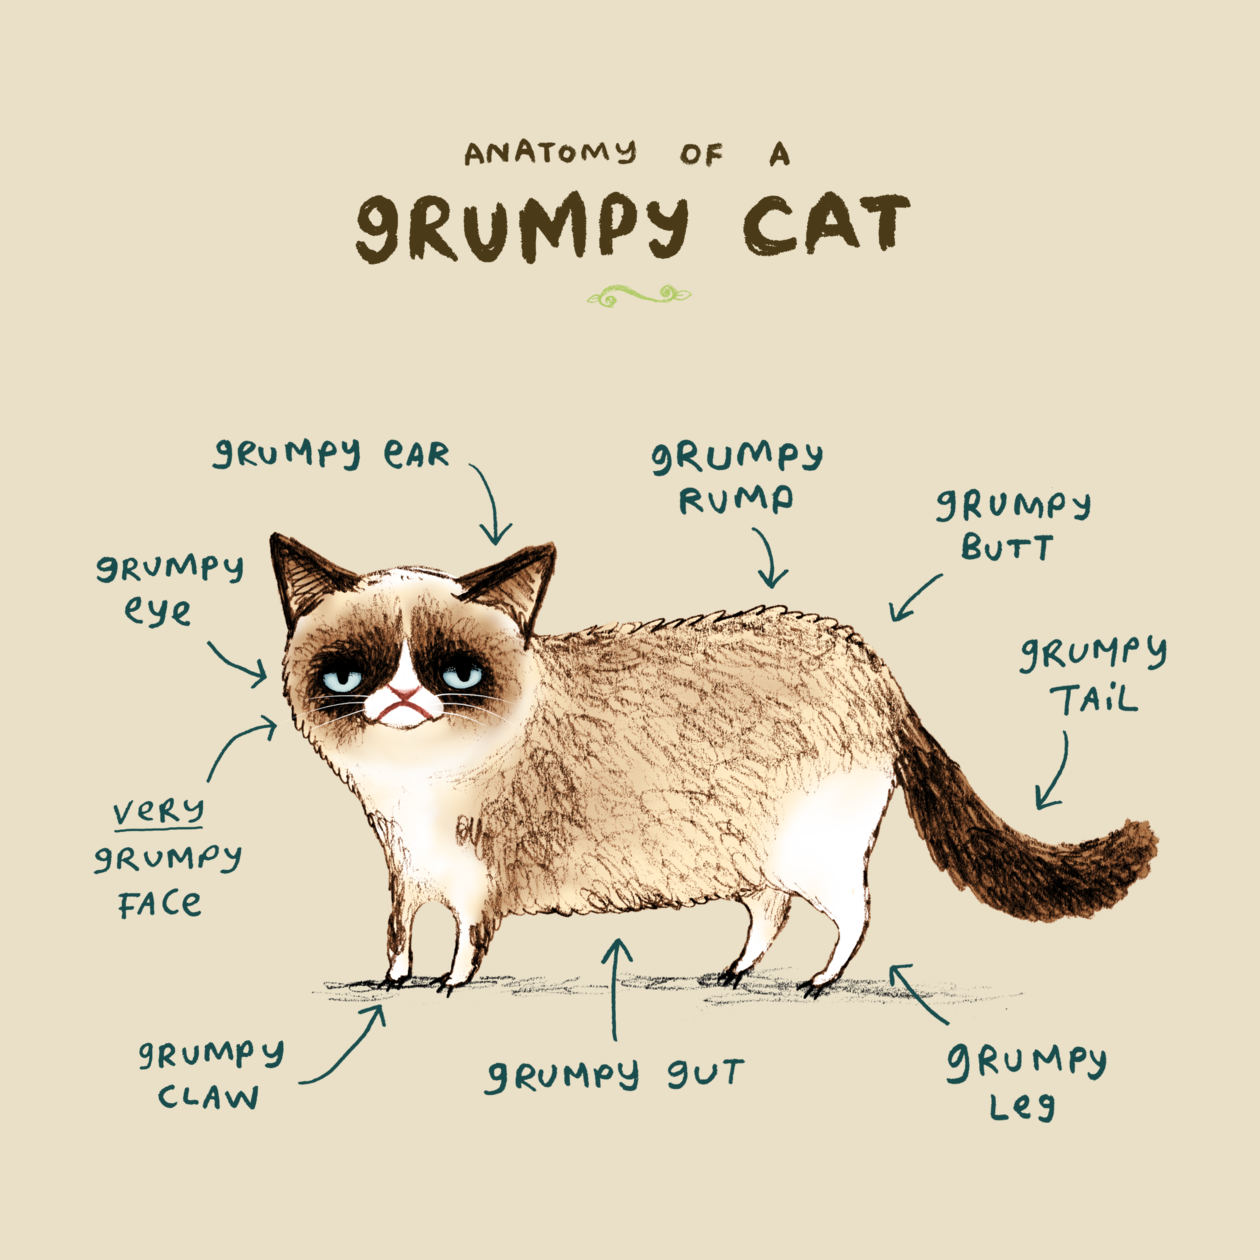 Cat Anatomy Diagram Rump - Radio Wiring Diagram •